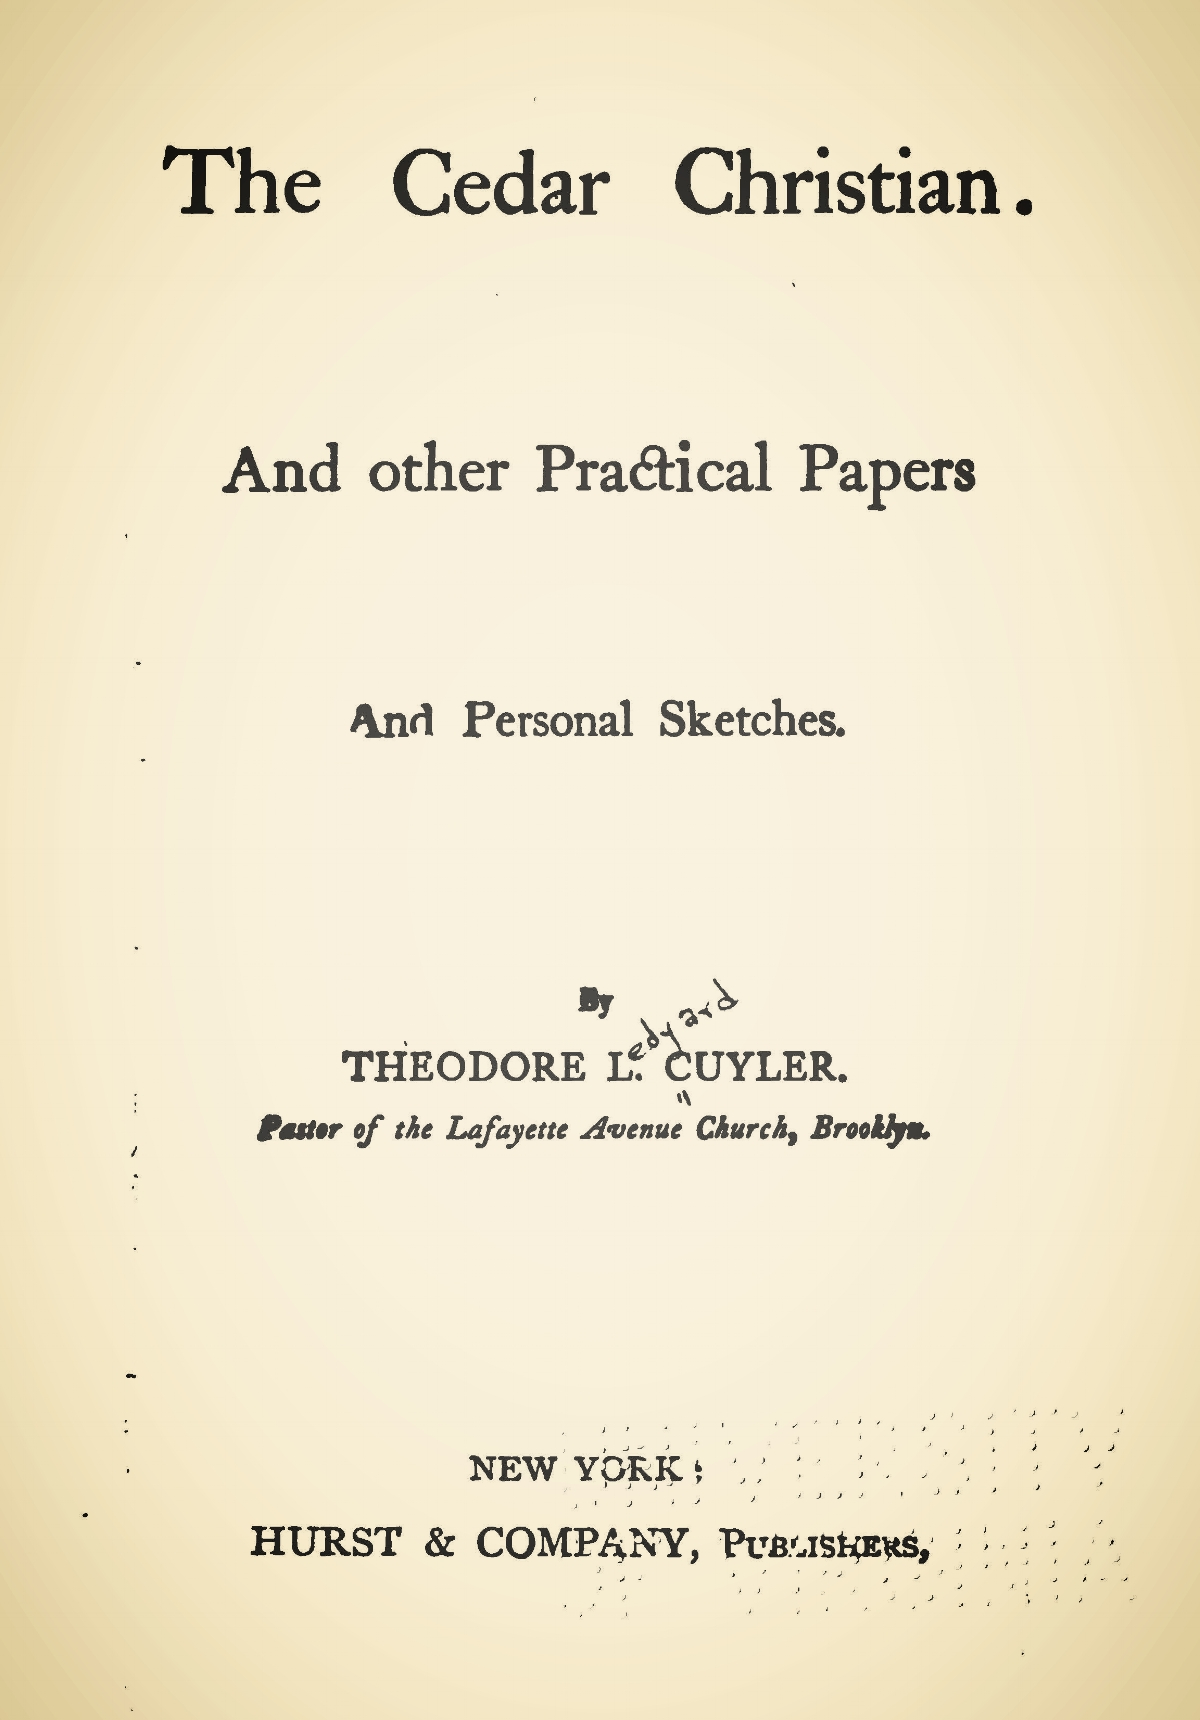 Cuyler, Theodore Ledyard, The Cedar Christian Title Page.jpg